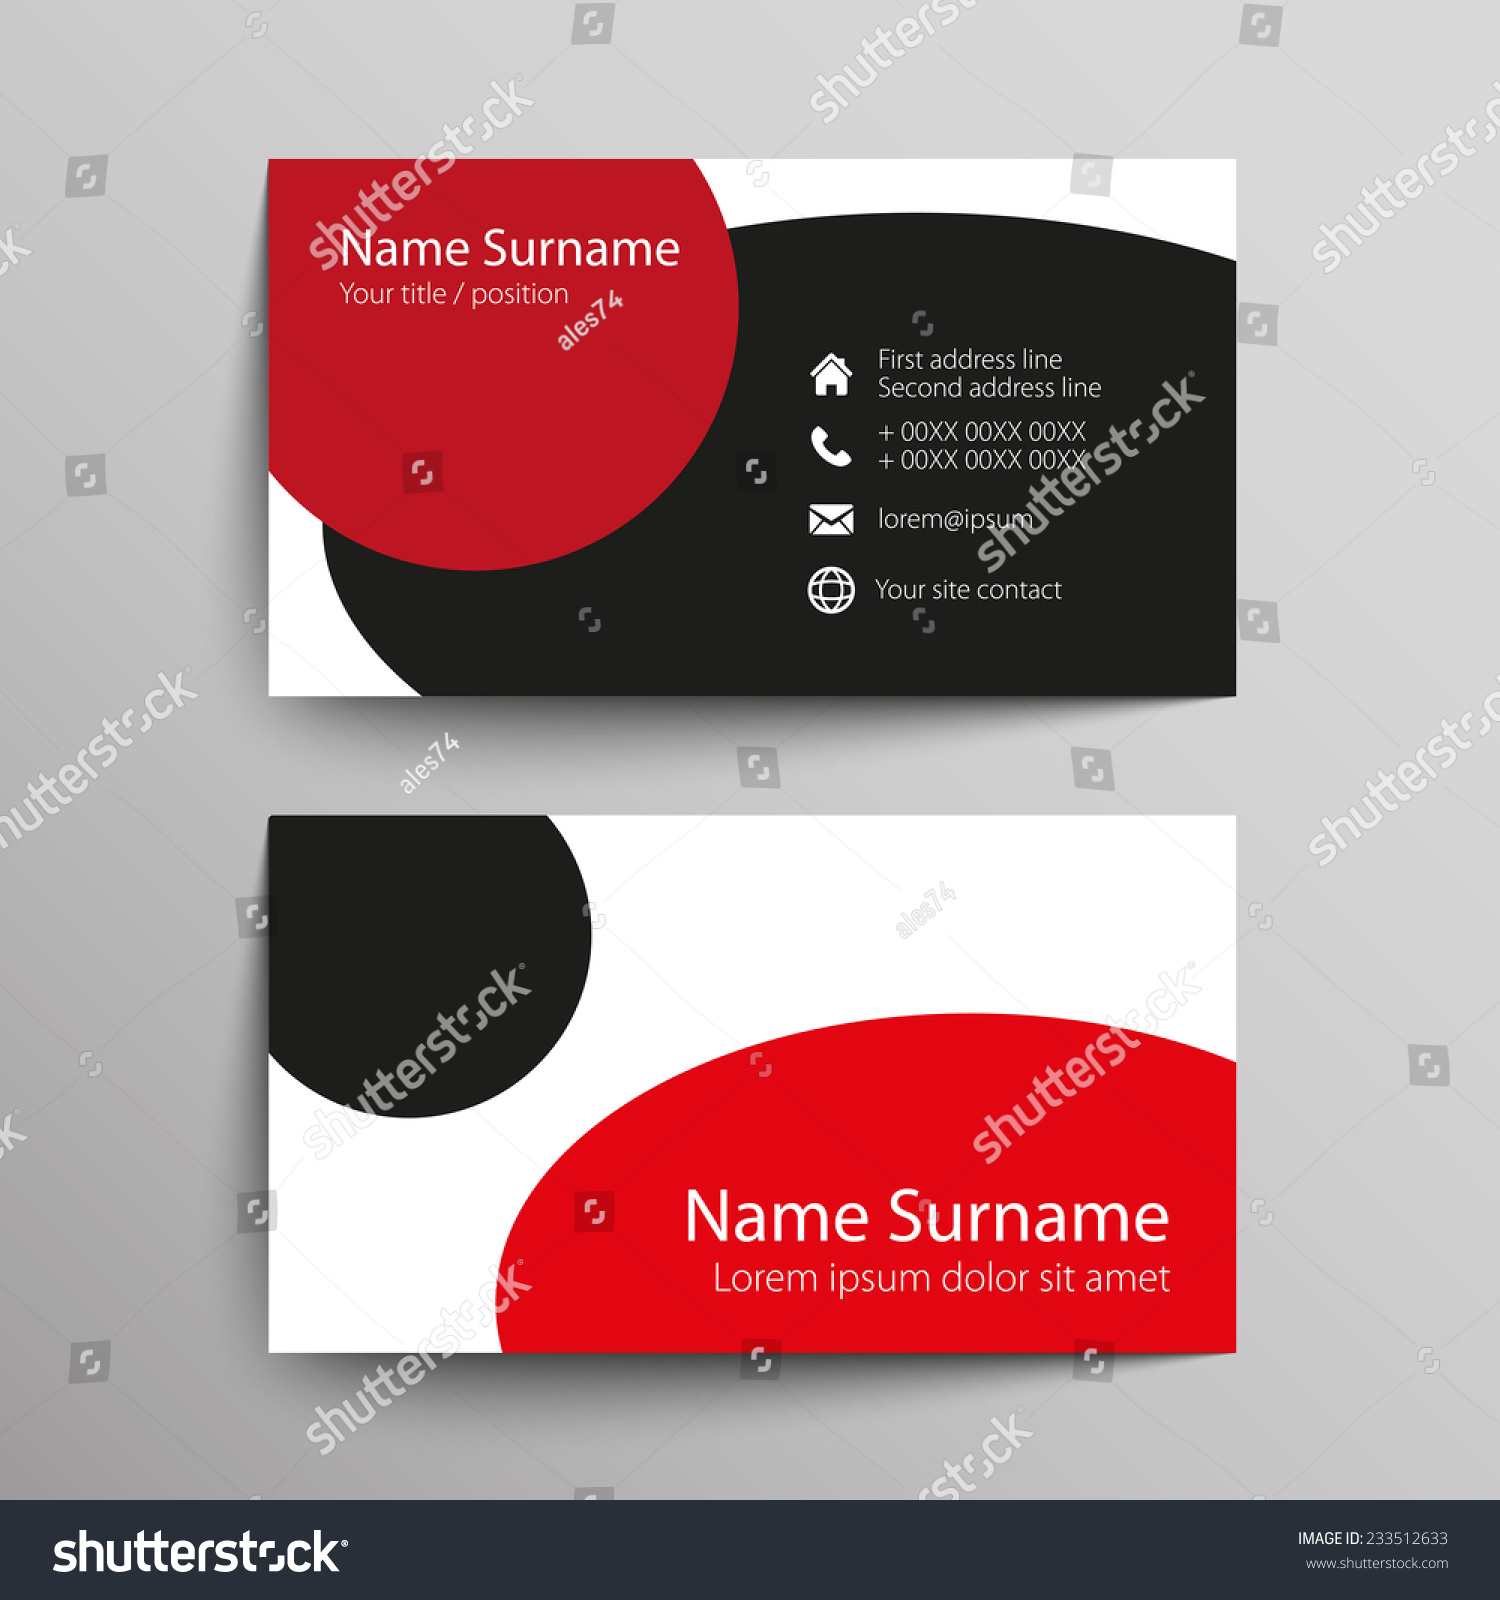 Modern Simple Business Card Template Vector Stock Vector 233512633 ...